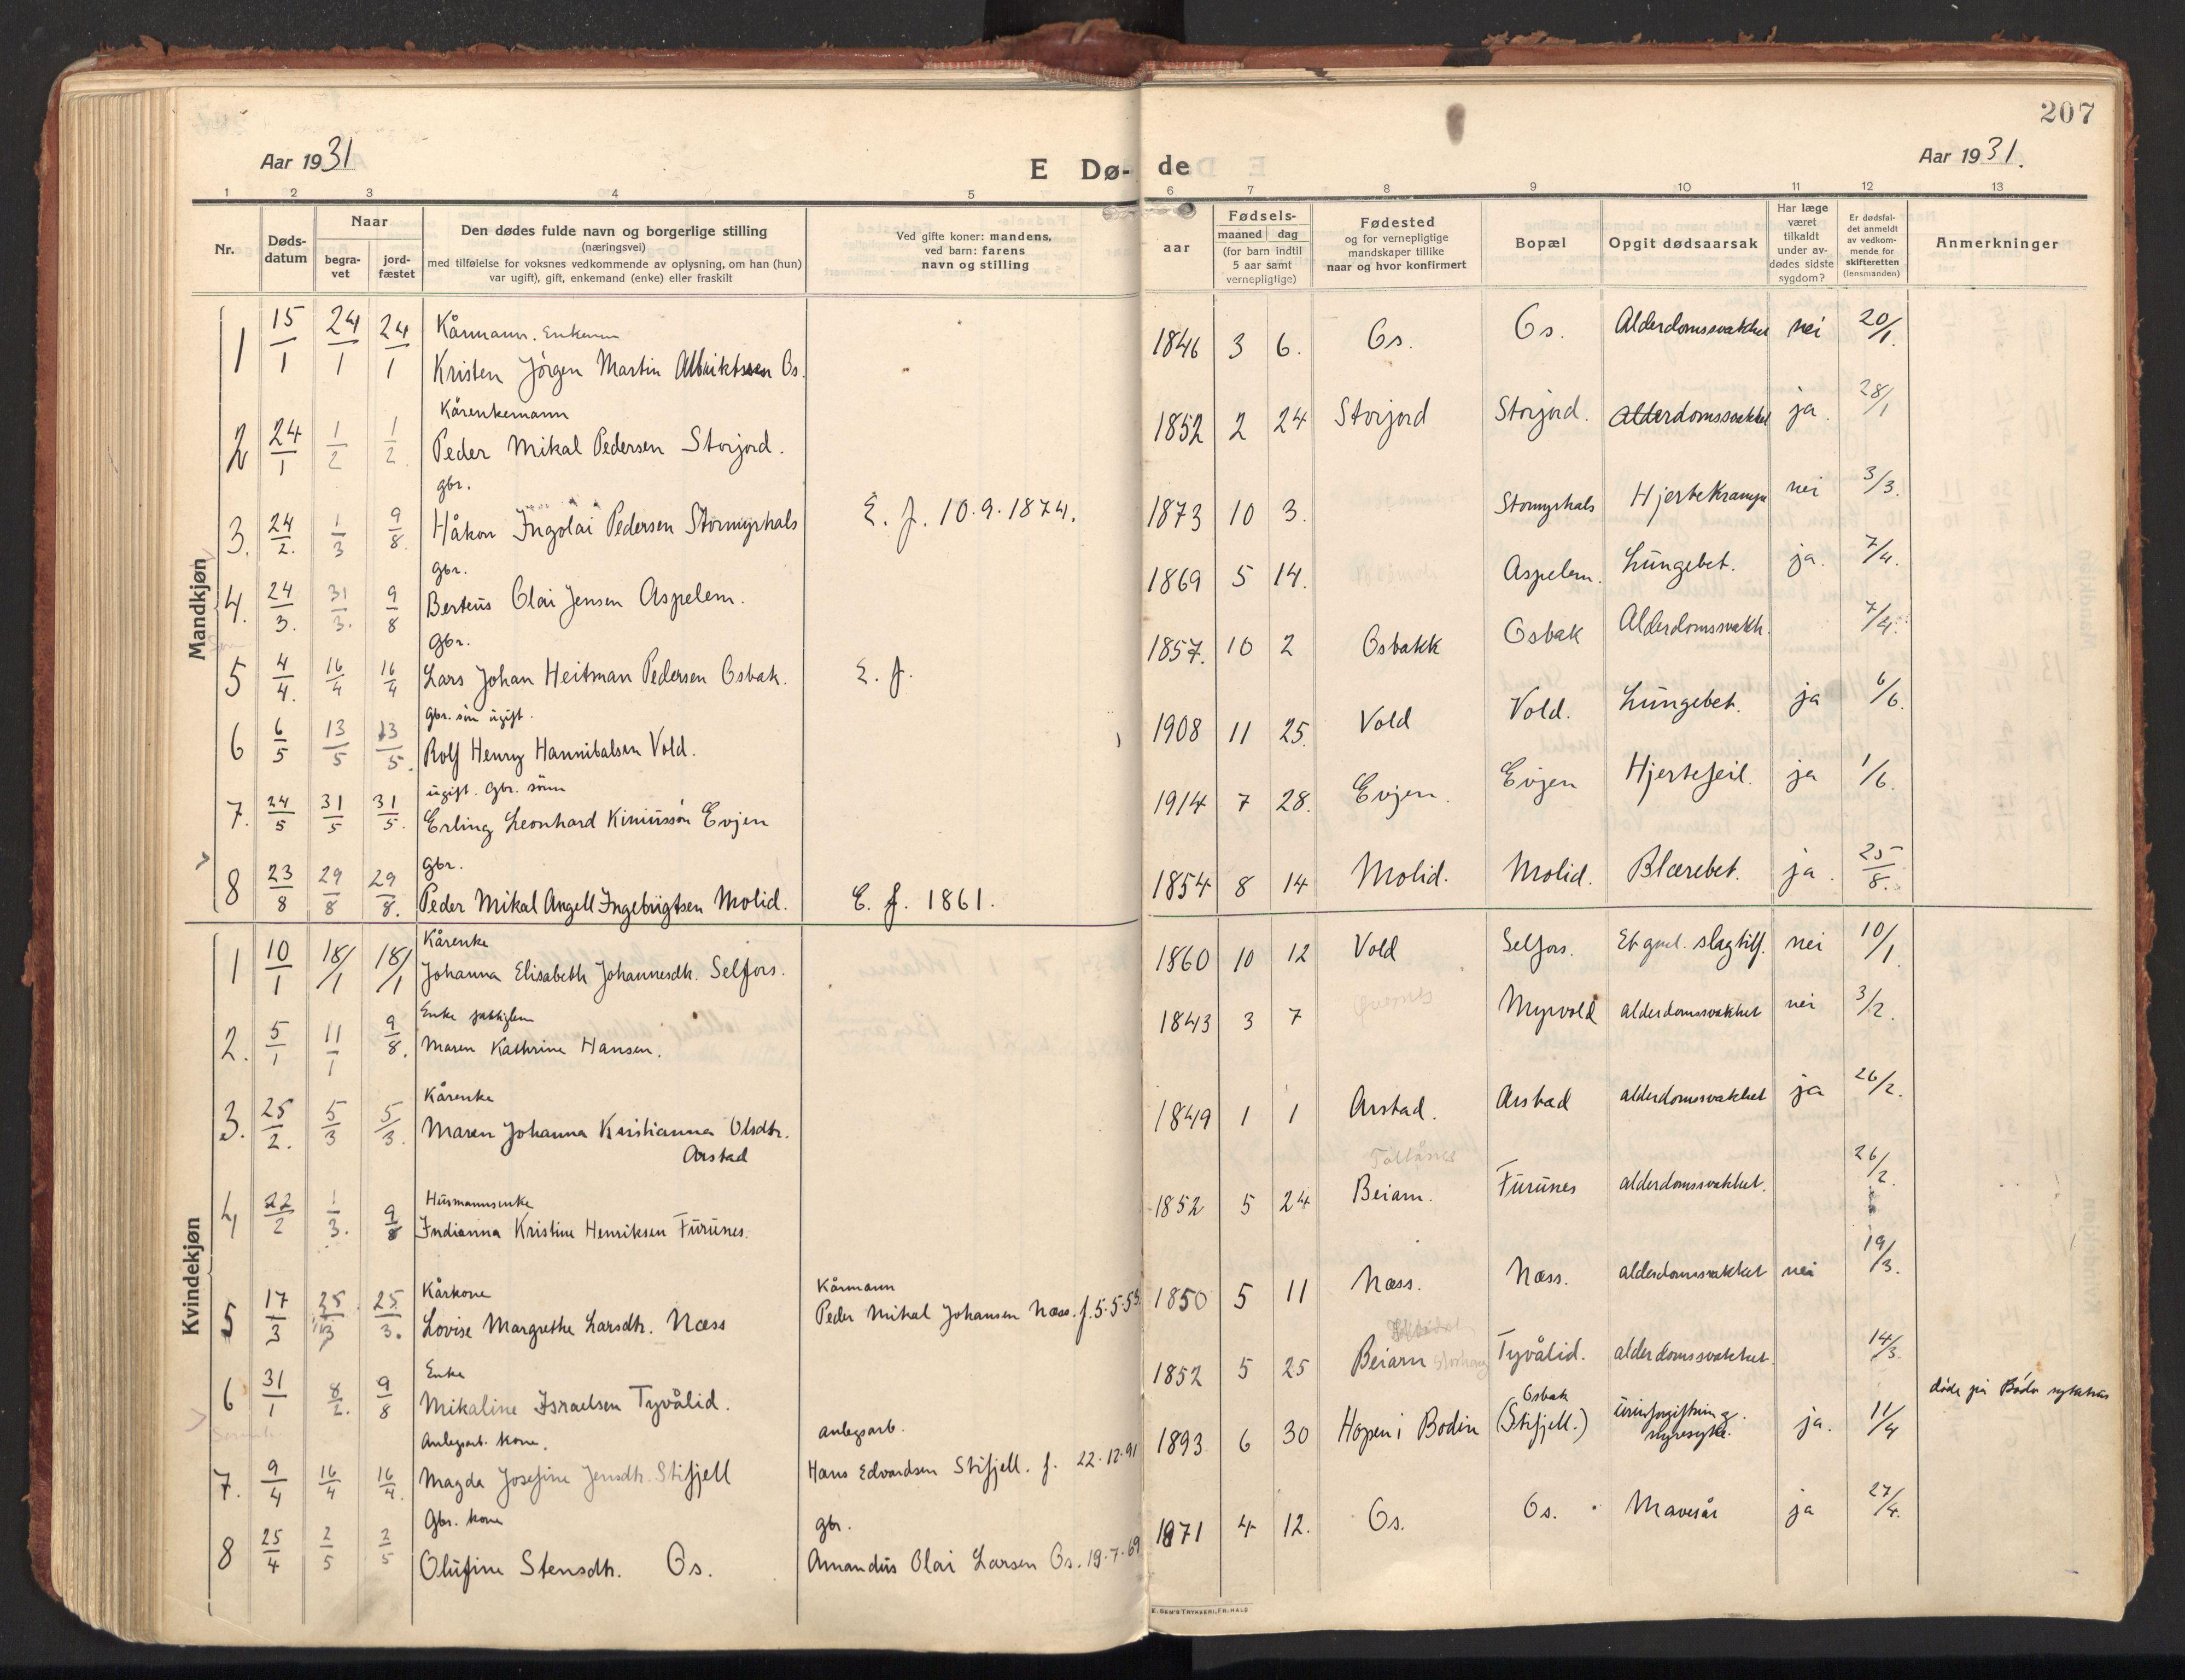 SAT, Ministerialprotokoller, klokkerbøker og fødselsregistre - Nordland, 846/L0650: Ministerialbok nr. 846A08, 1916-1935, s. 207